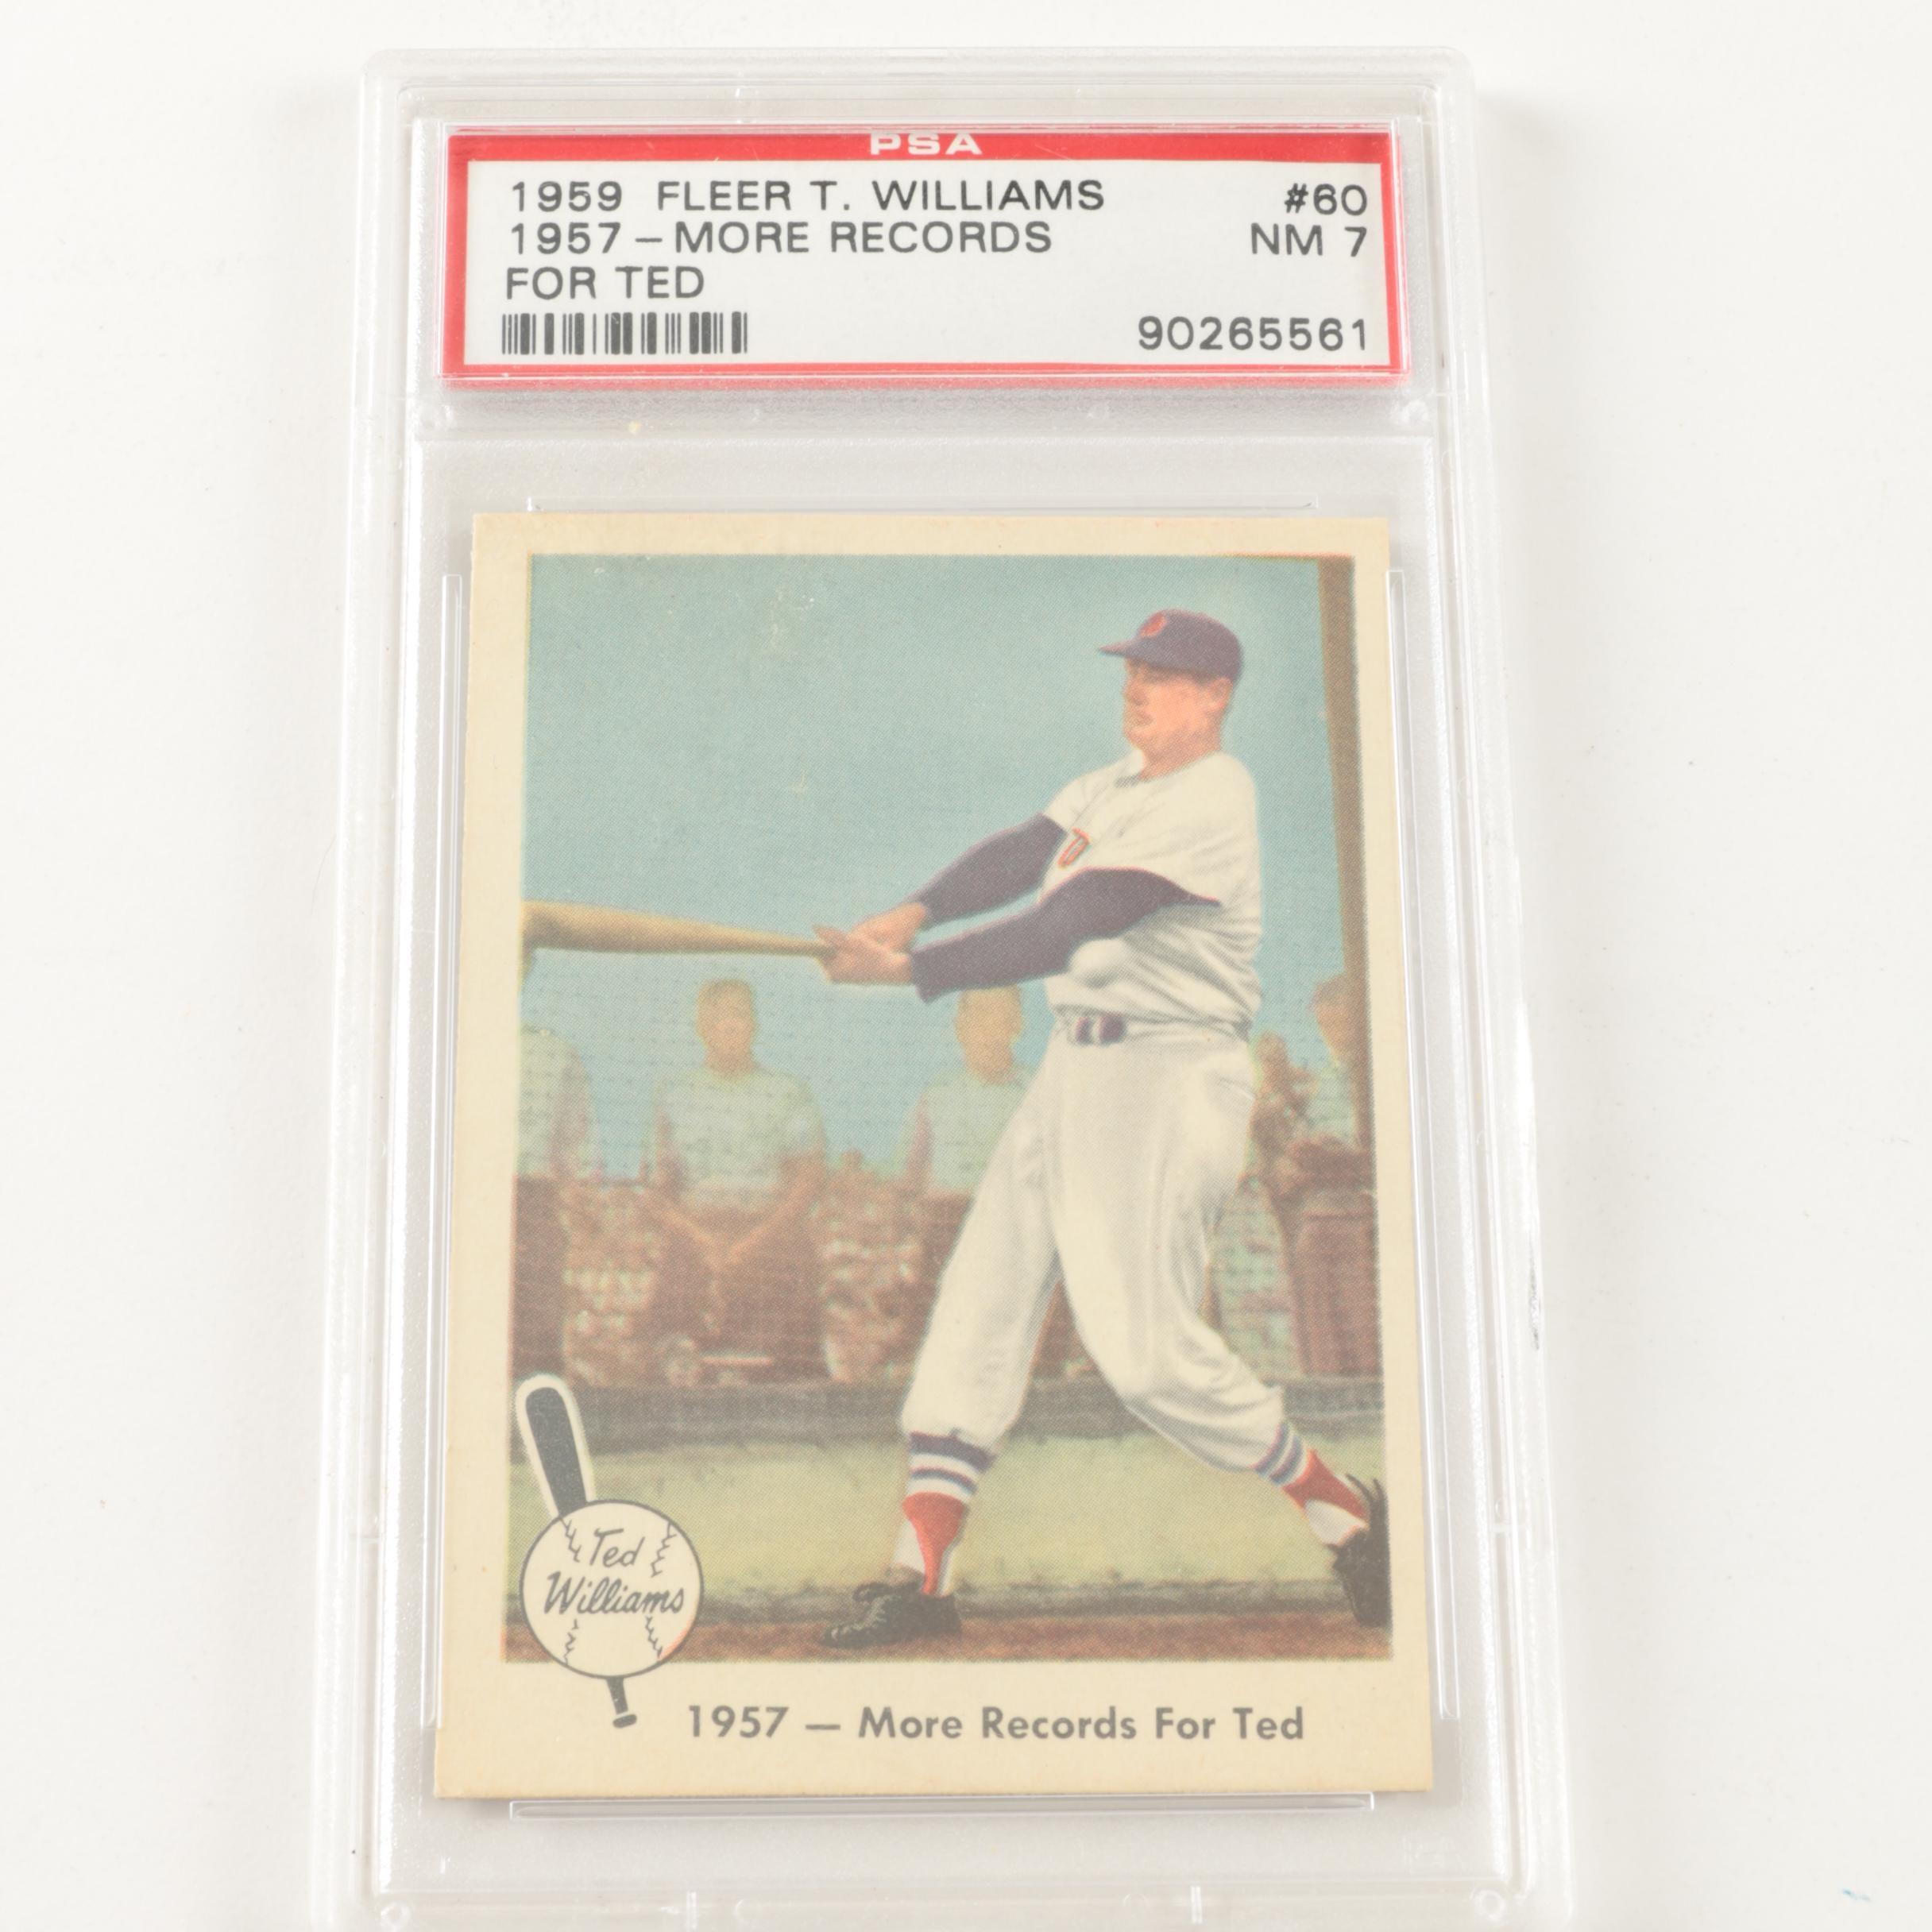 1959 Fleer Ted Williams Baseball Card